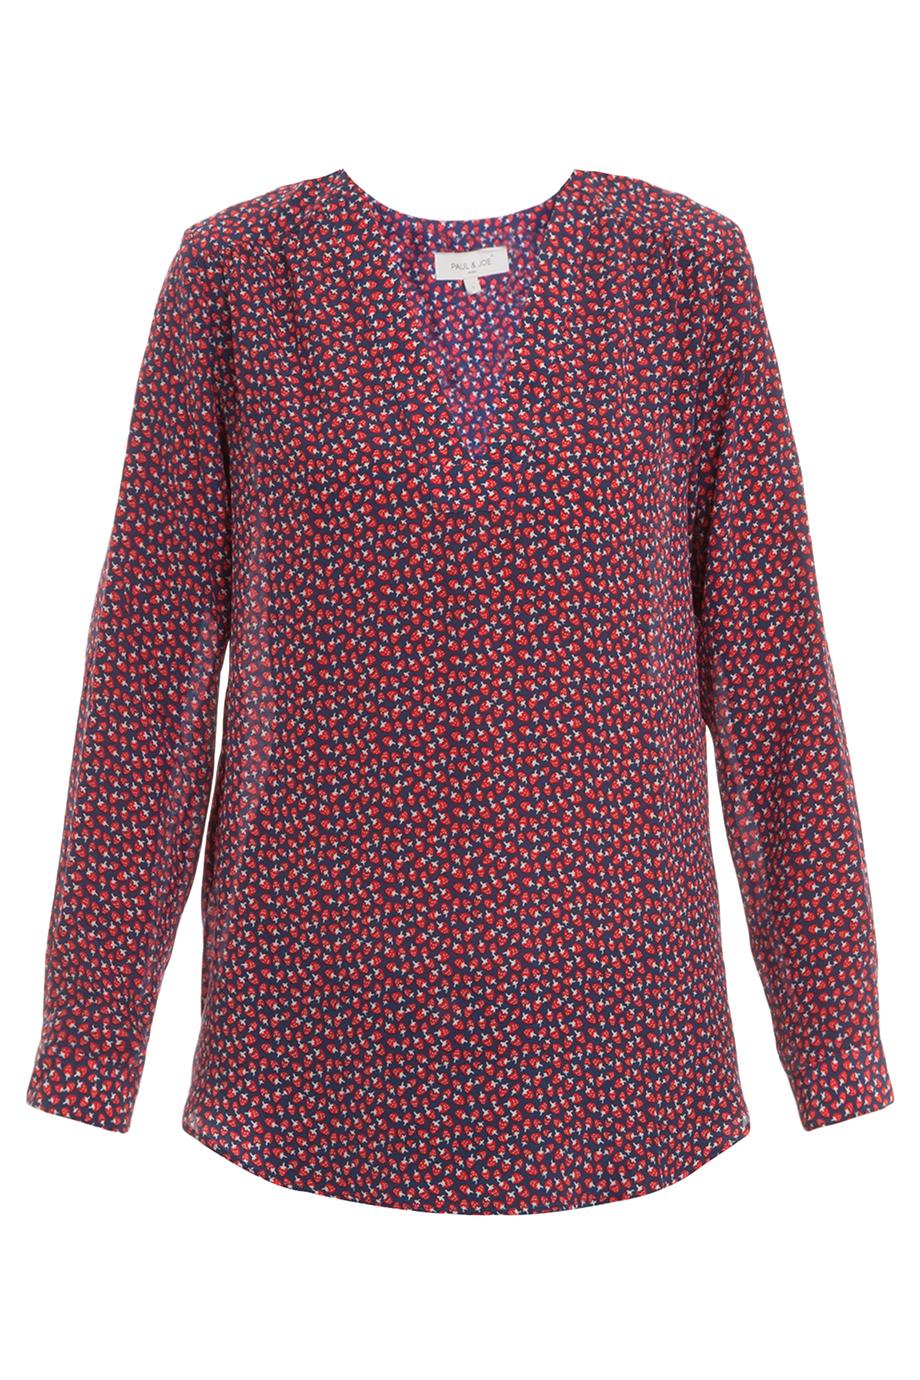 paul-joe-blue-strawberry-silk-top-product-1-27966880-2-788337128-normal.jpeg